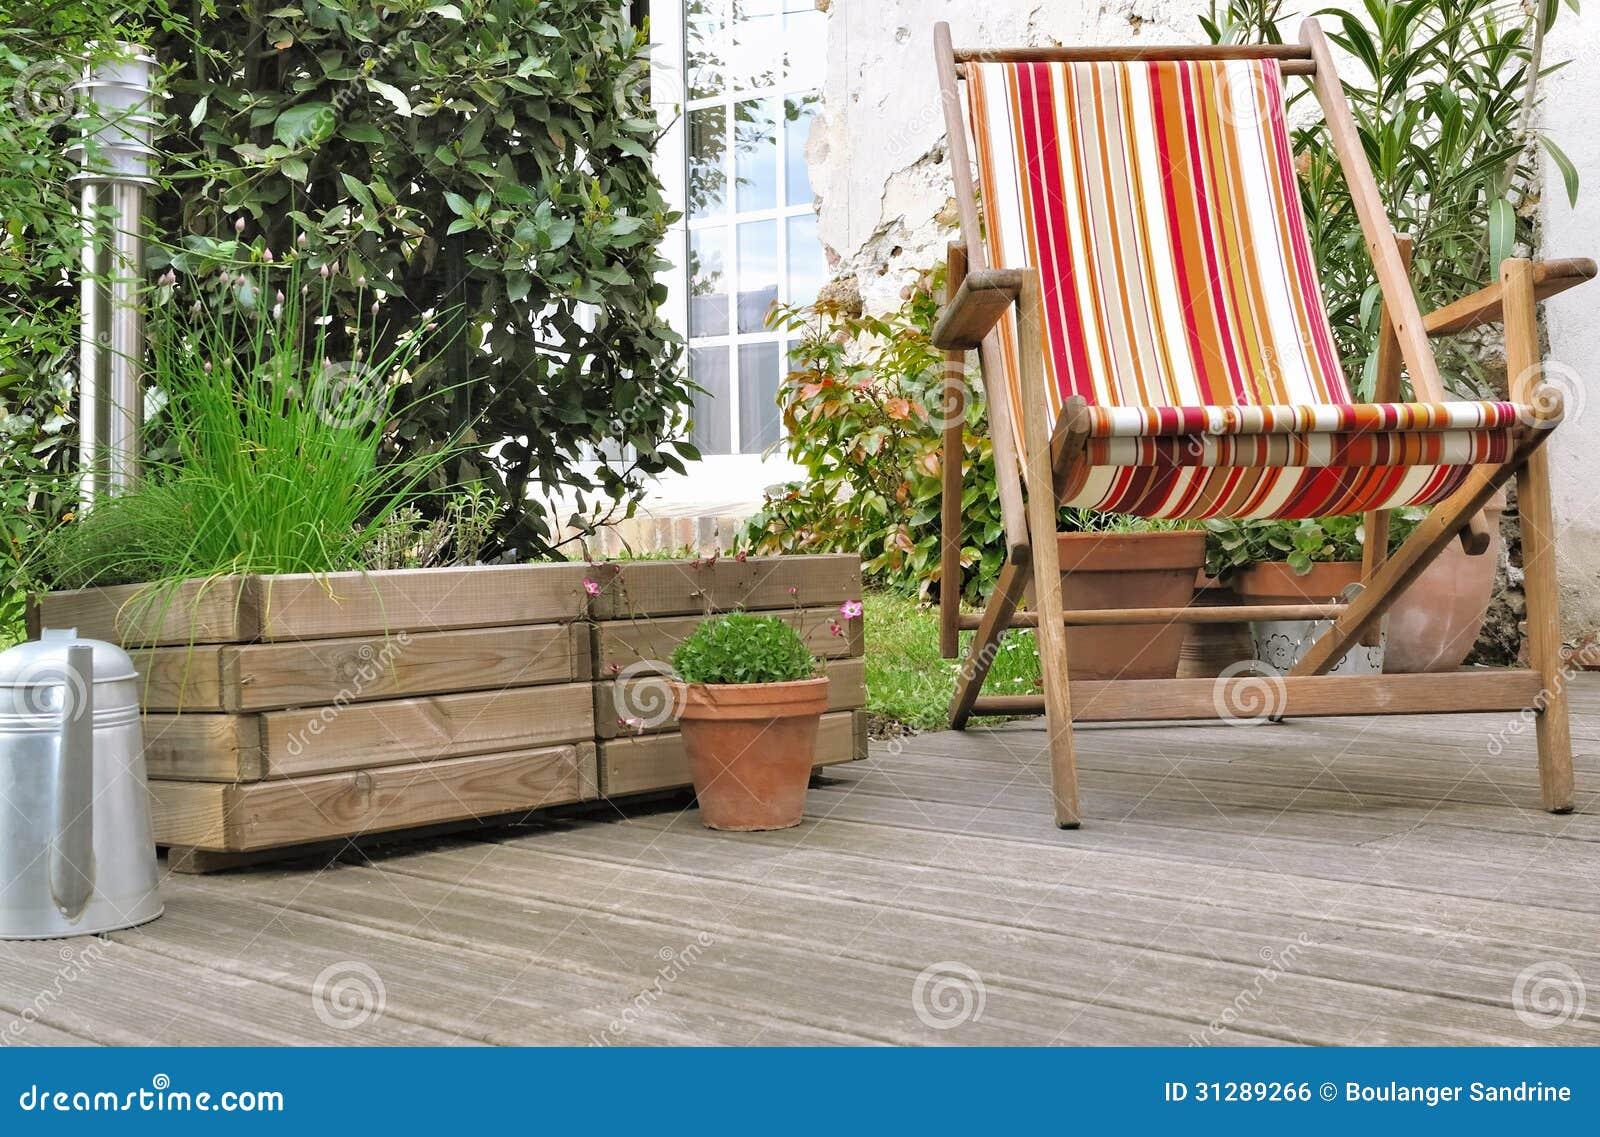 Deckchair на деревянной террасе